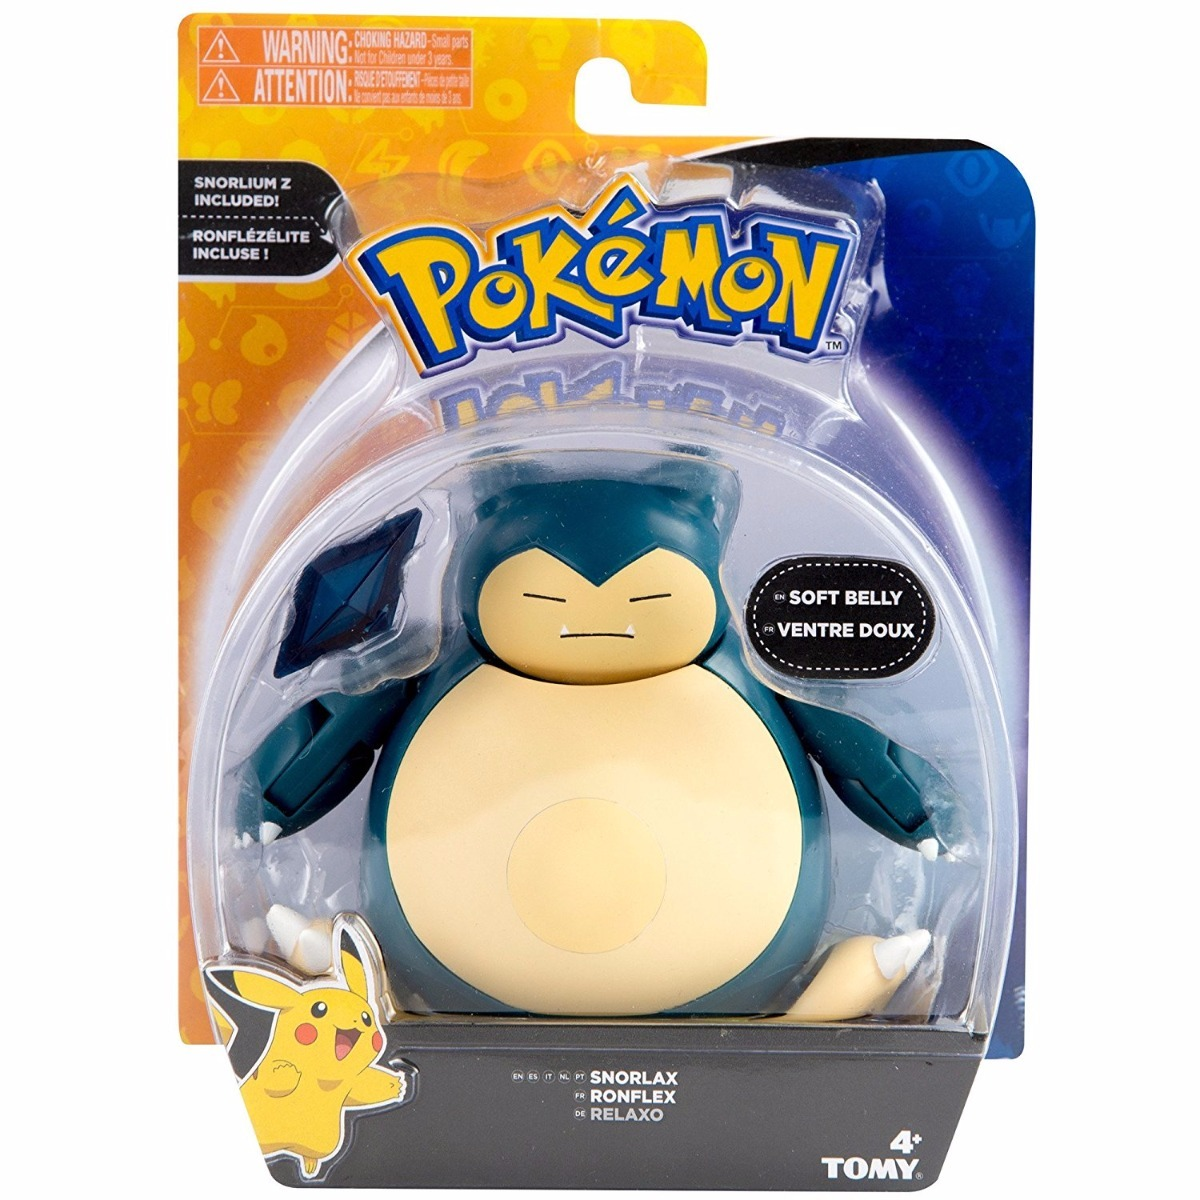 Pokemon Z En Mercado Libre M Xico # Muebles Pokemon Mercadolibre